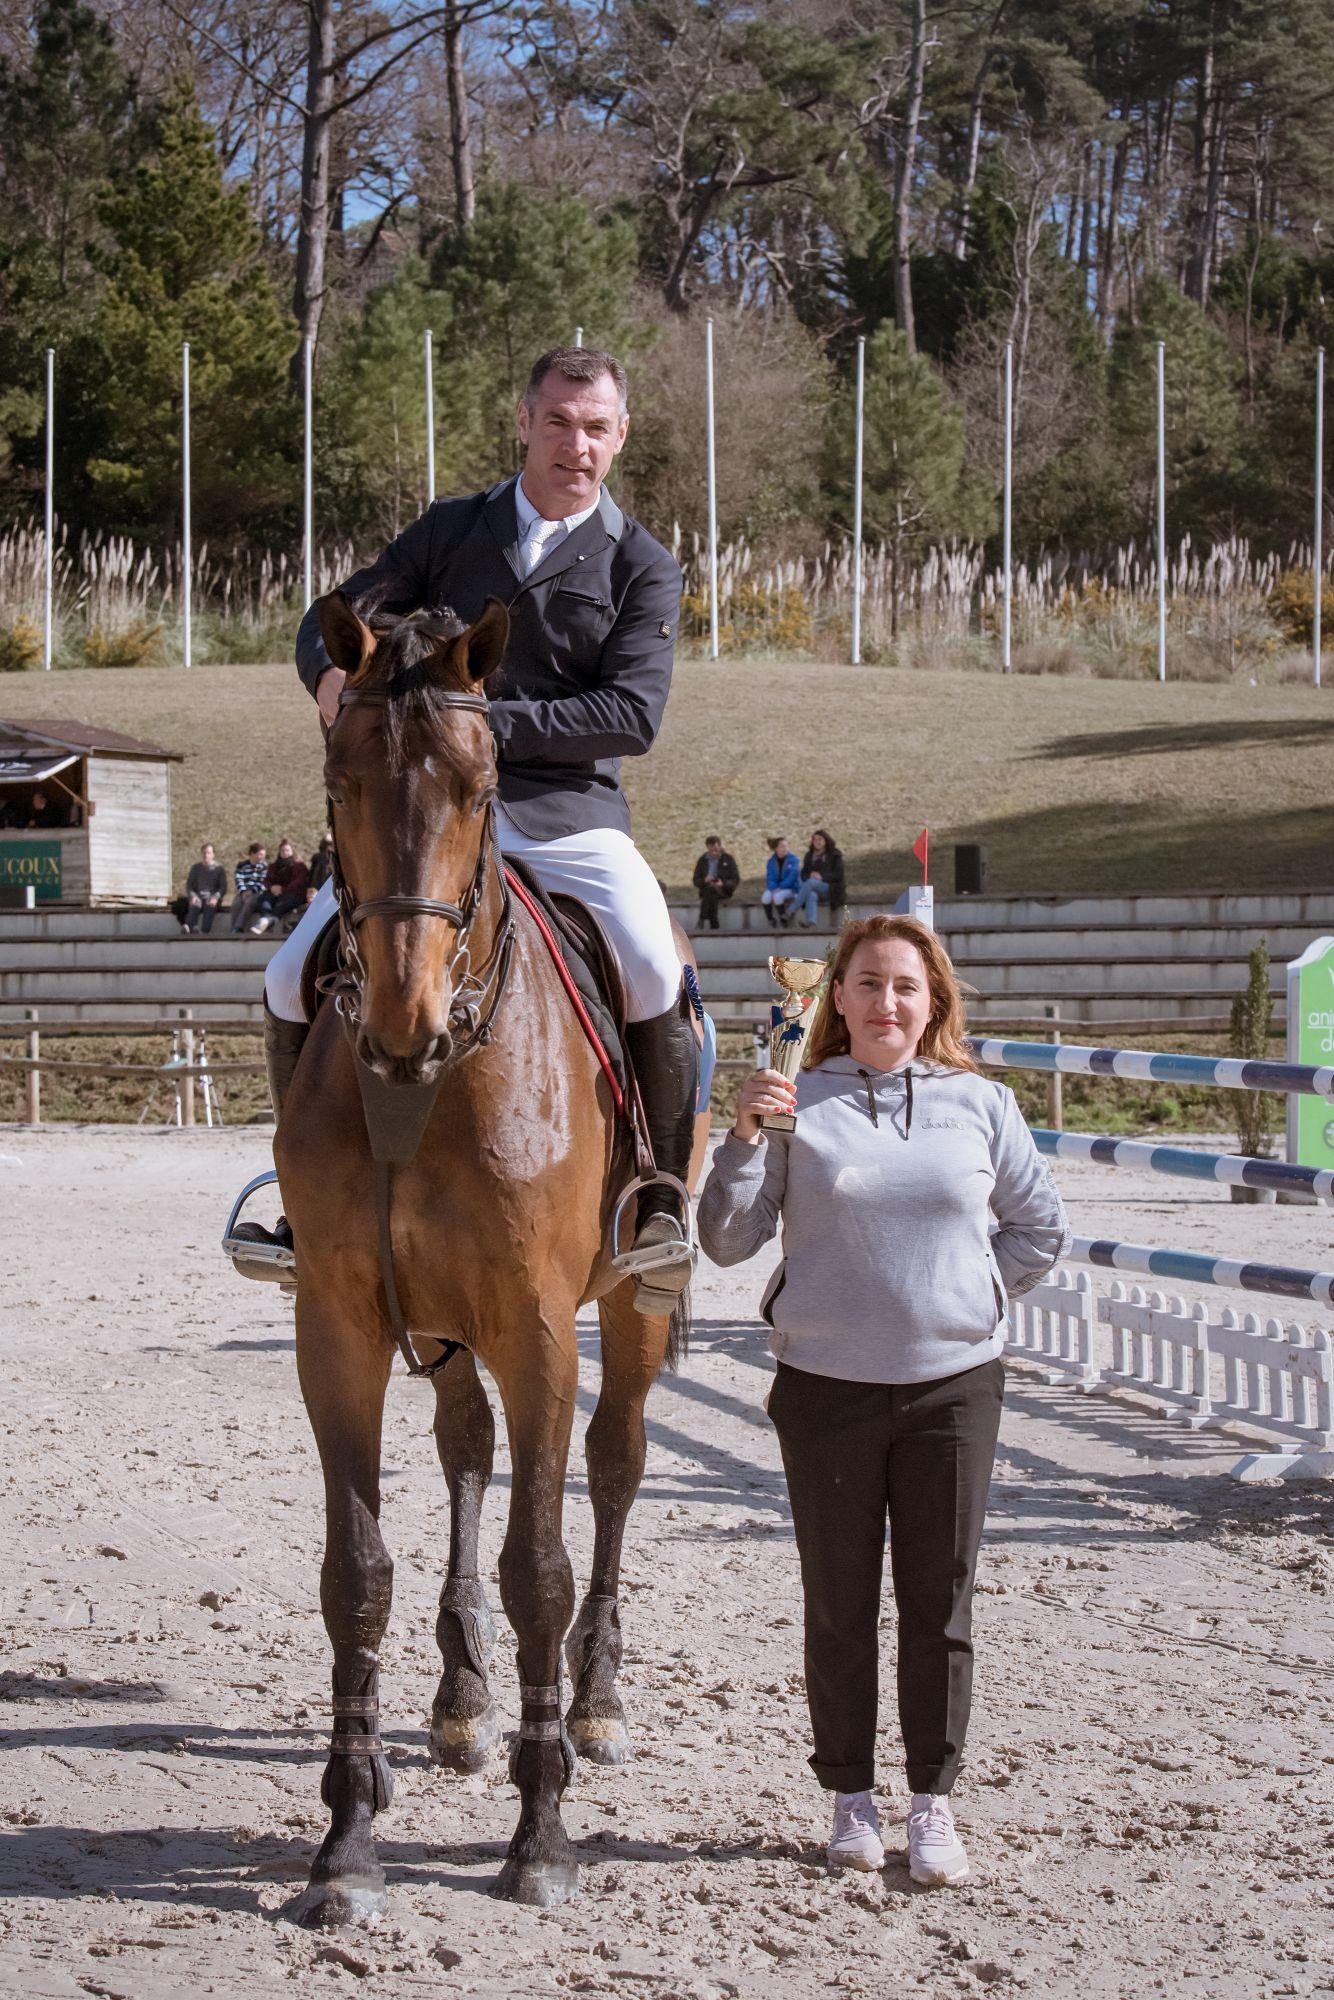 diamanti-van-de-helle-z-las-jump-biarritz-show-jumping-horses-feb-23-rd-2019-1